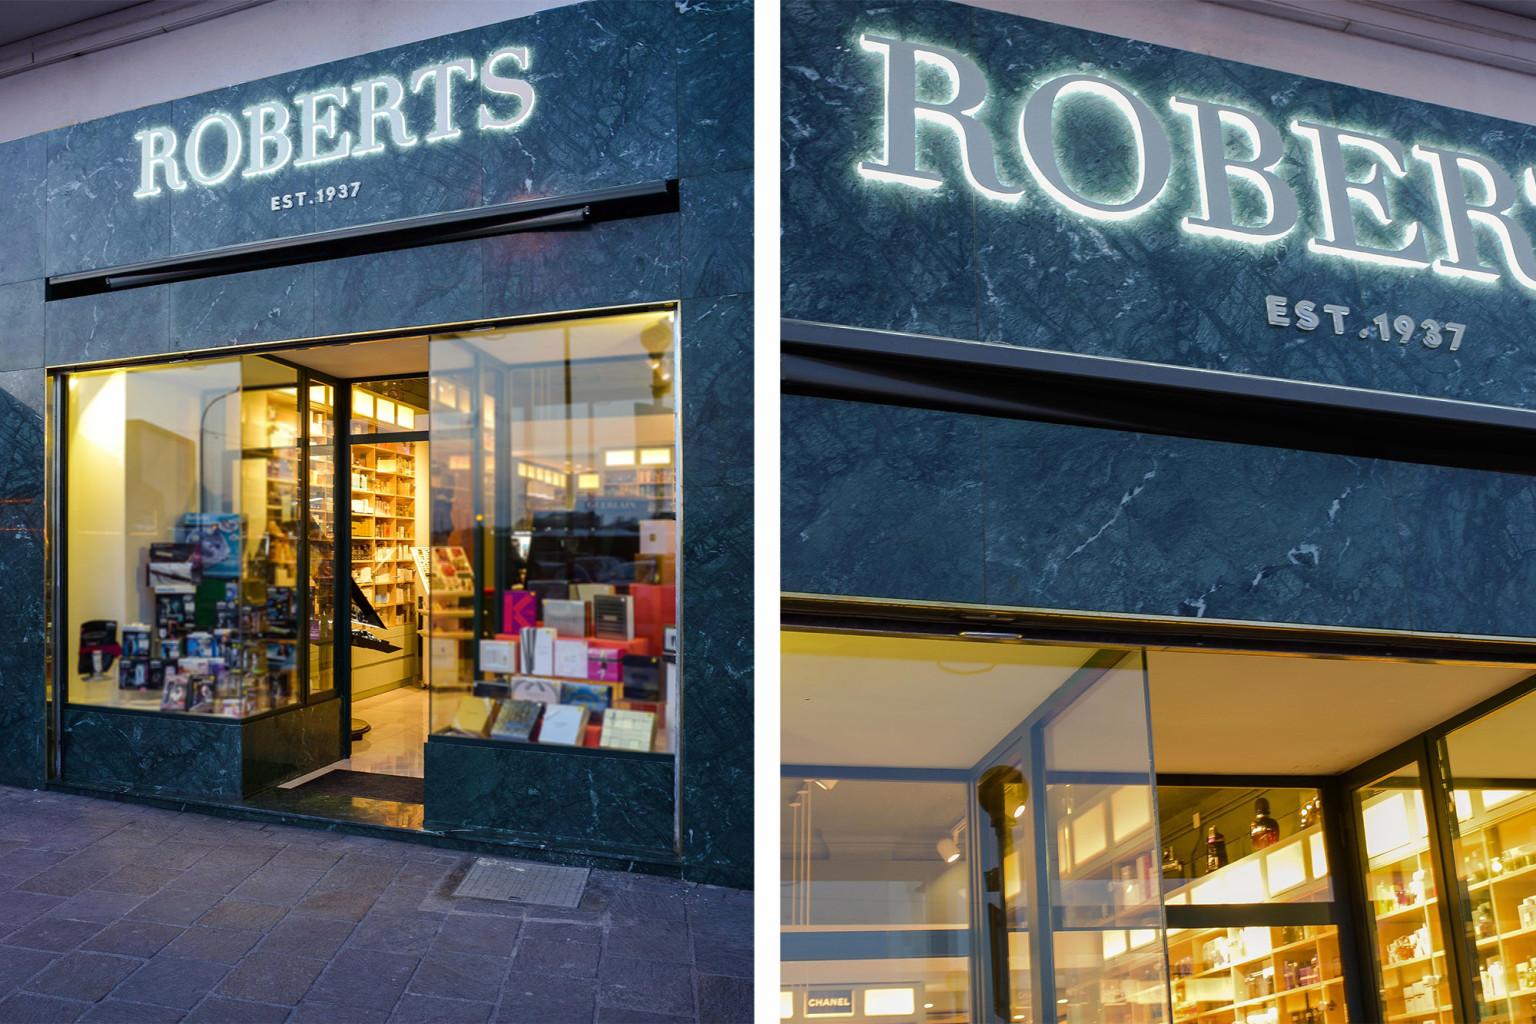 ROBERTS 00